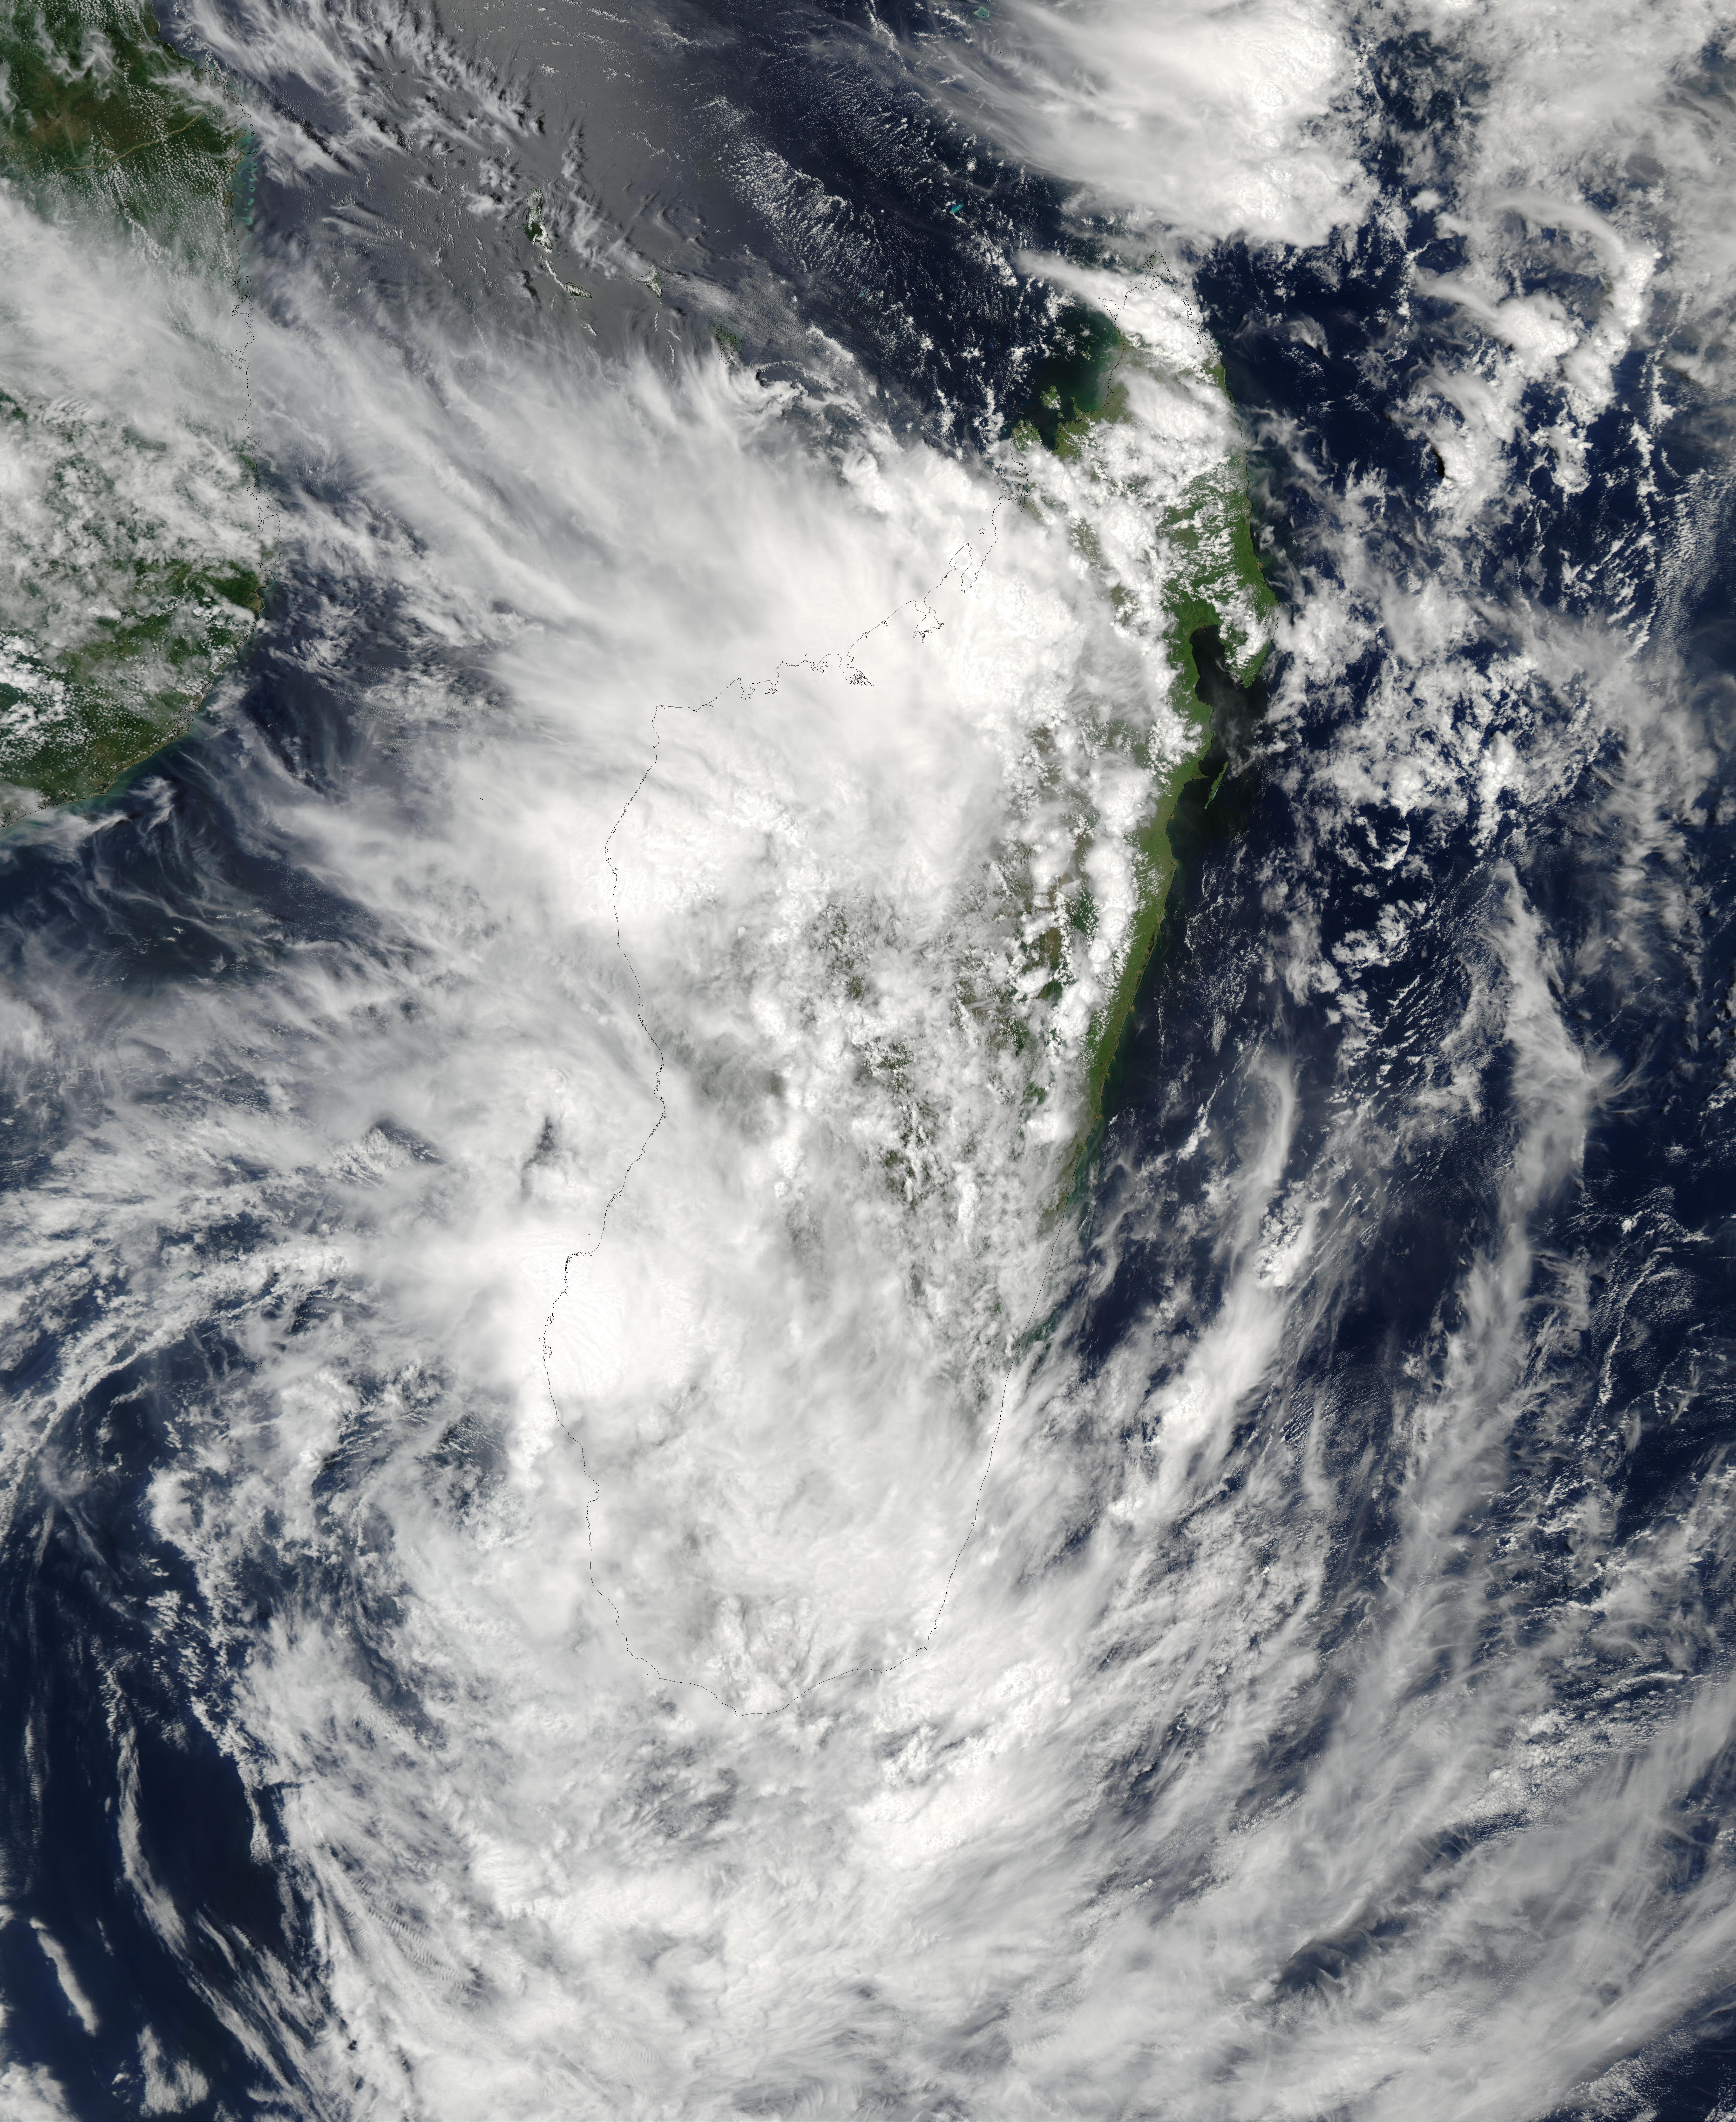 NASA Visible Earth: Tropical Cyclone Fari (11S) over ...